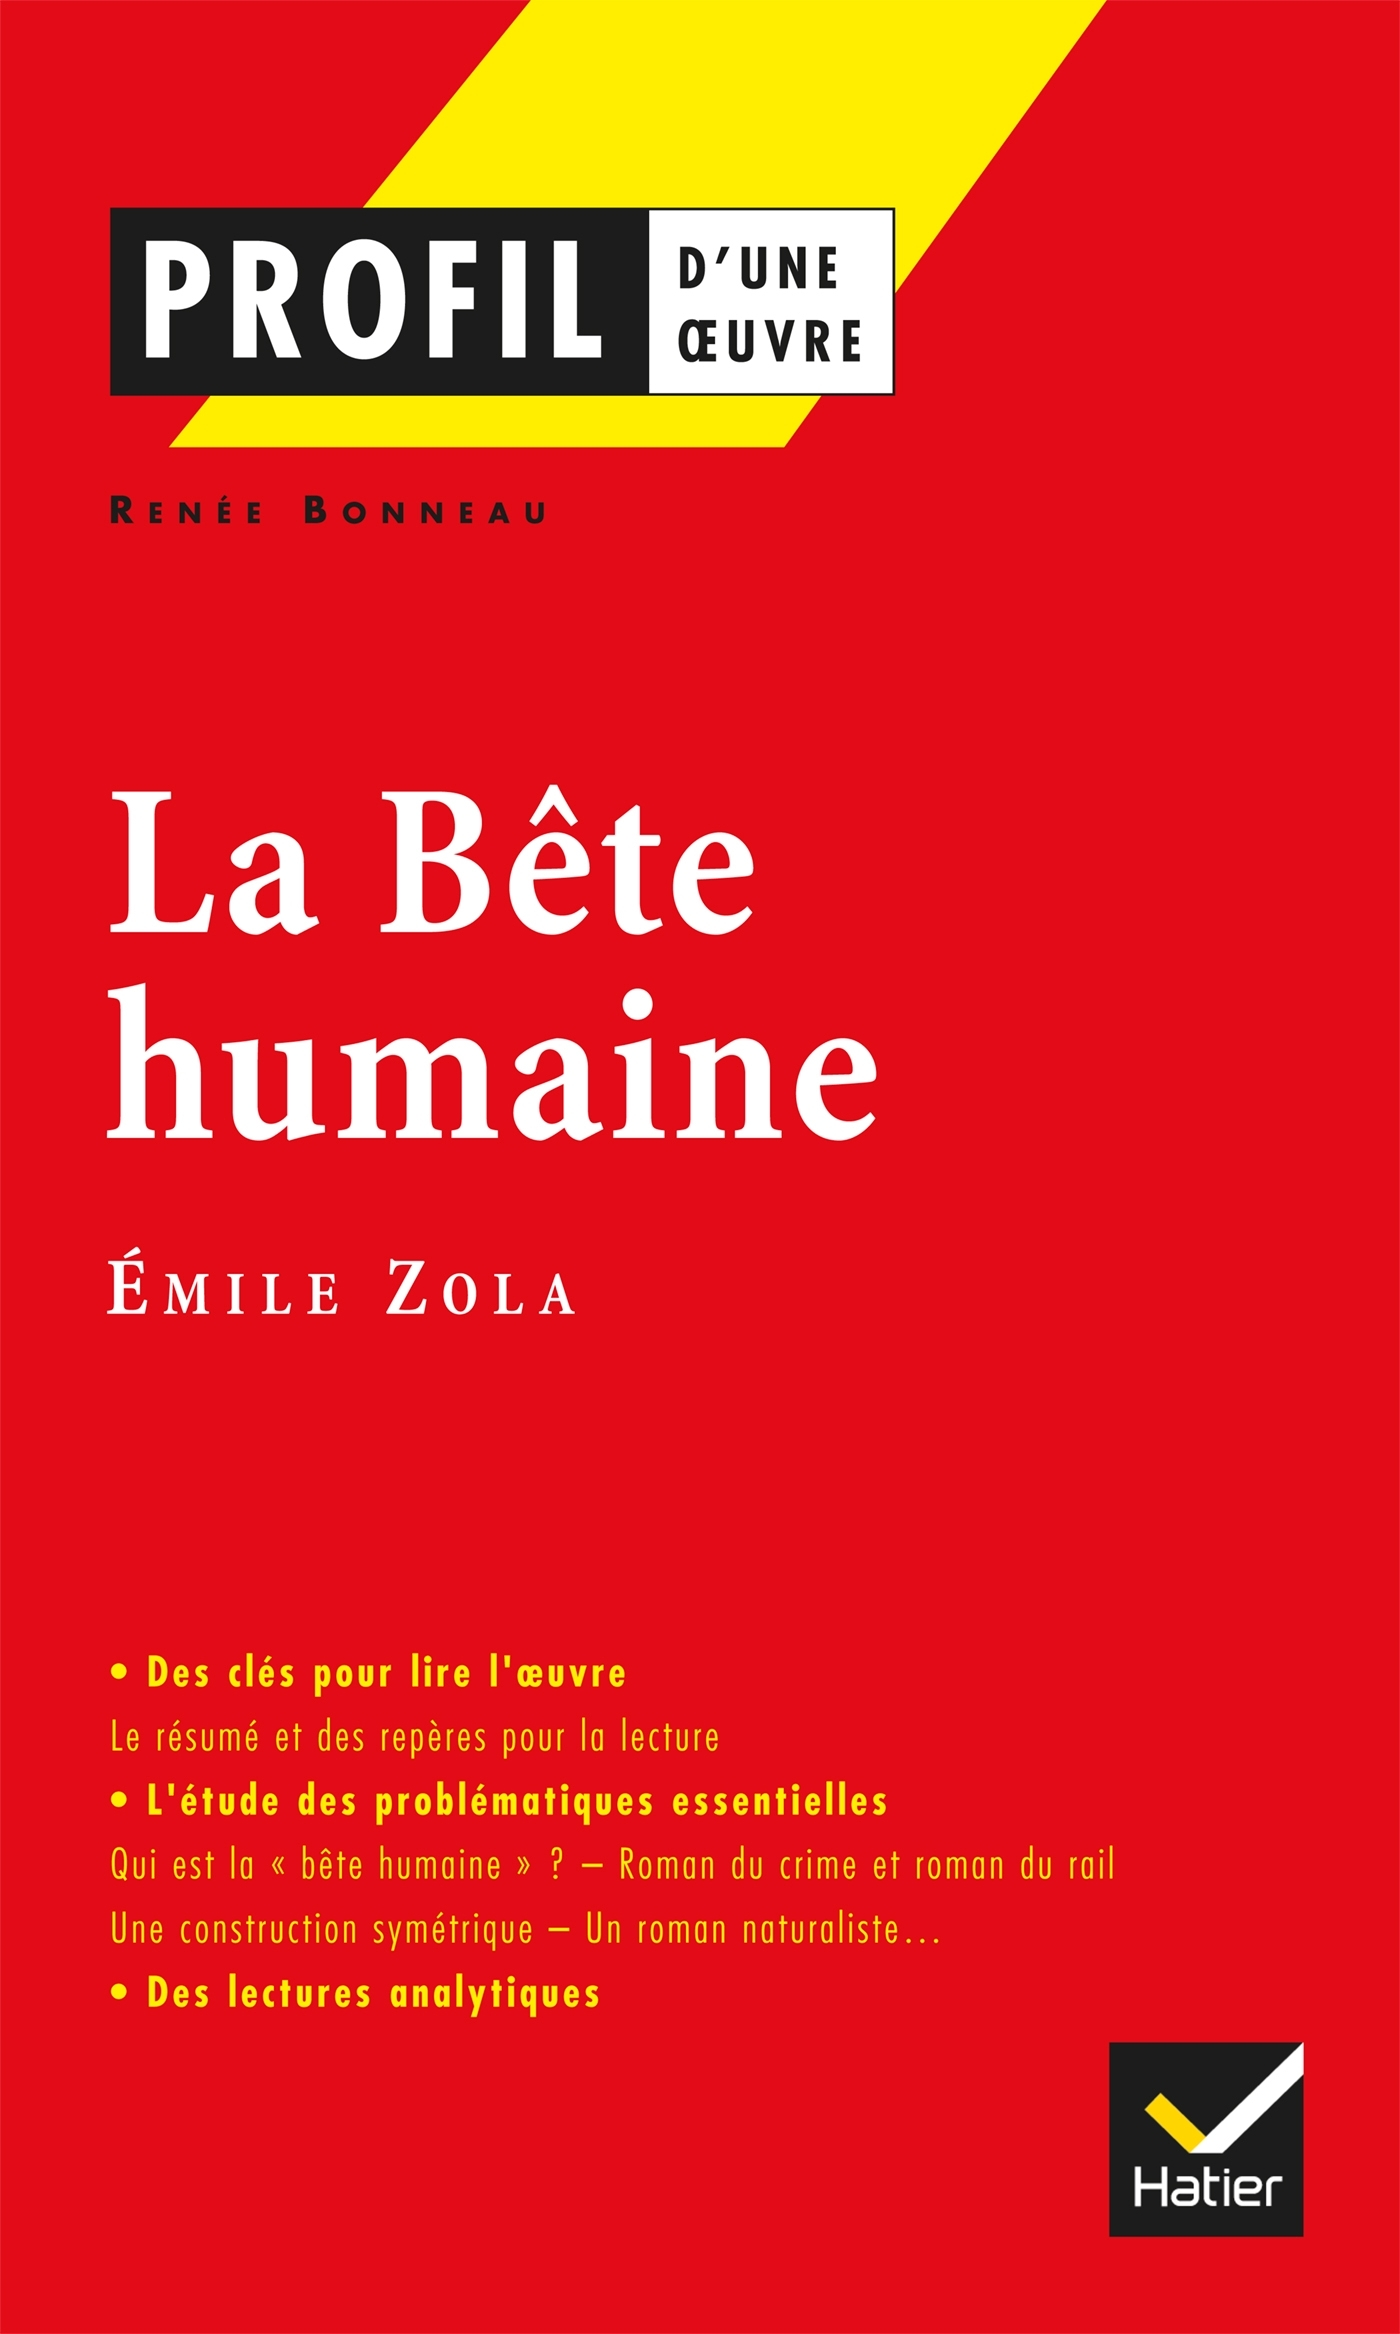 100 - PROFIL - ZOLA (EMILE) : LA BETE HUMAINE - ANALYSE LITTERAIRE DE L'OEUVRE